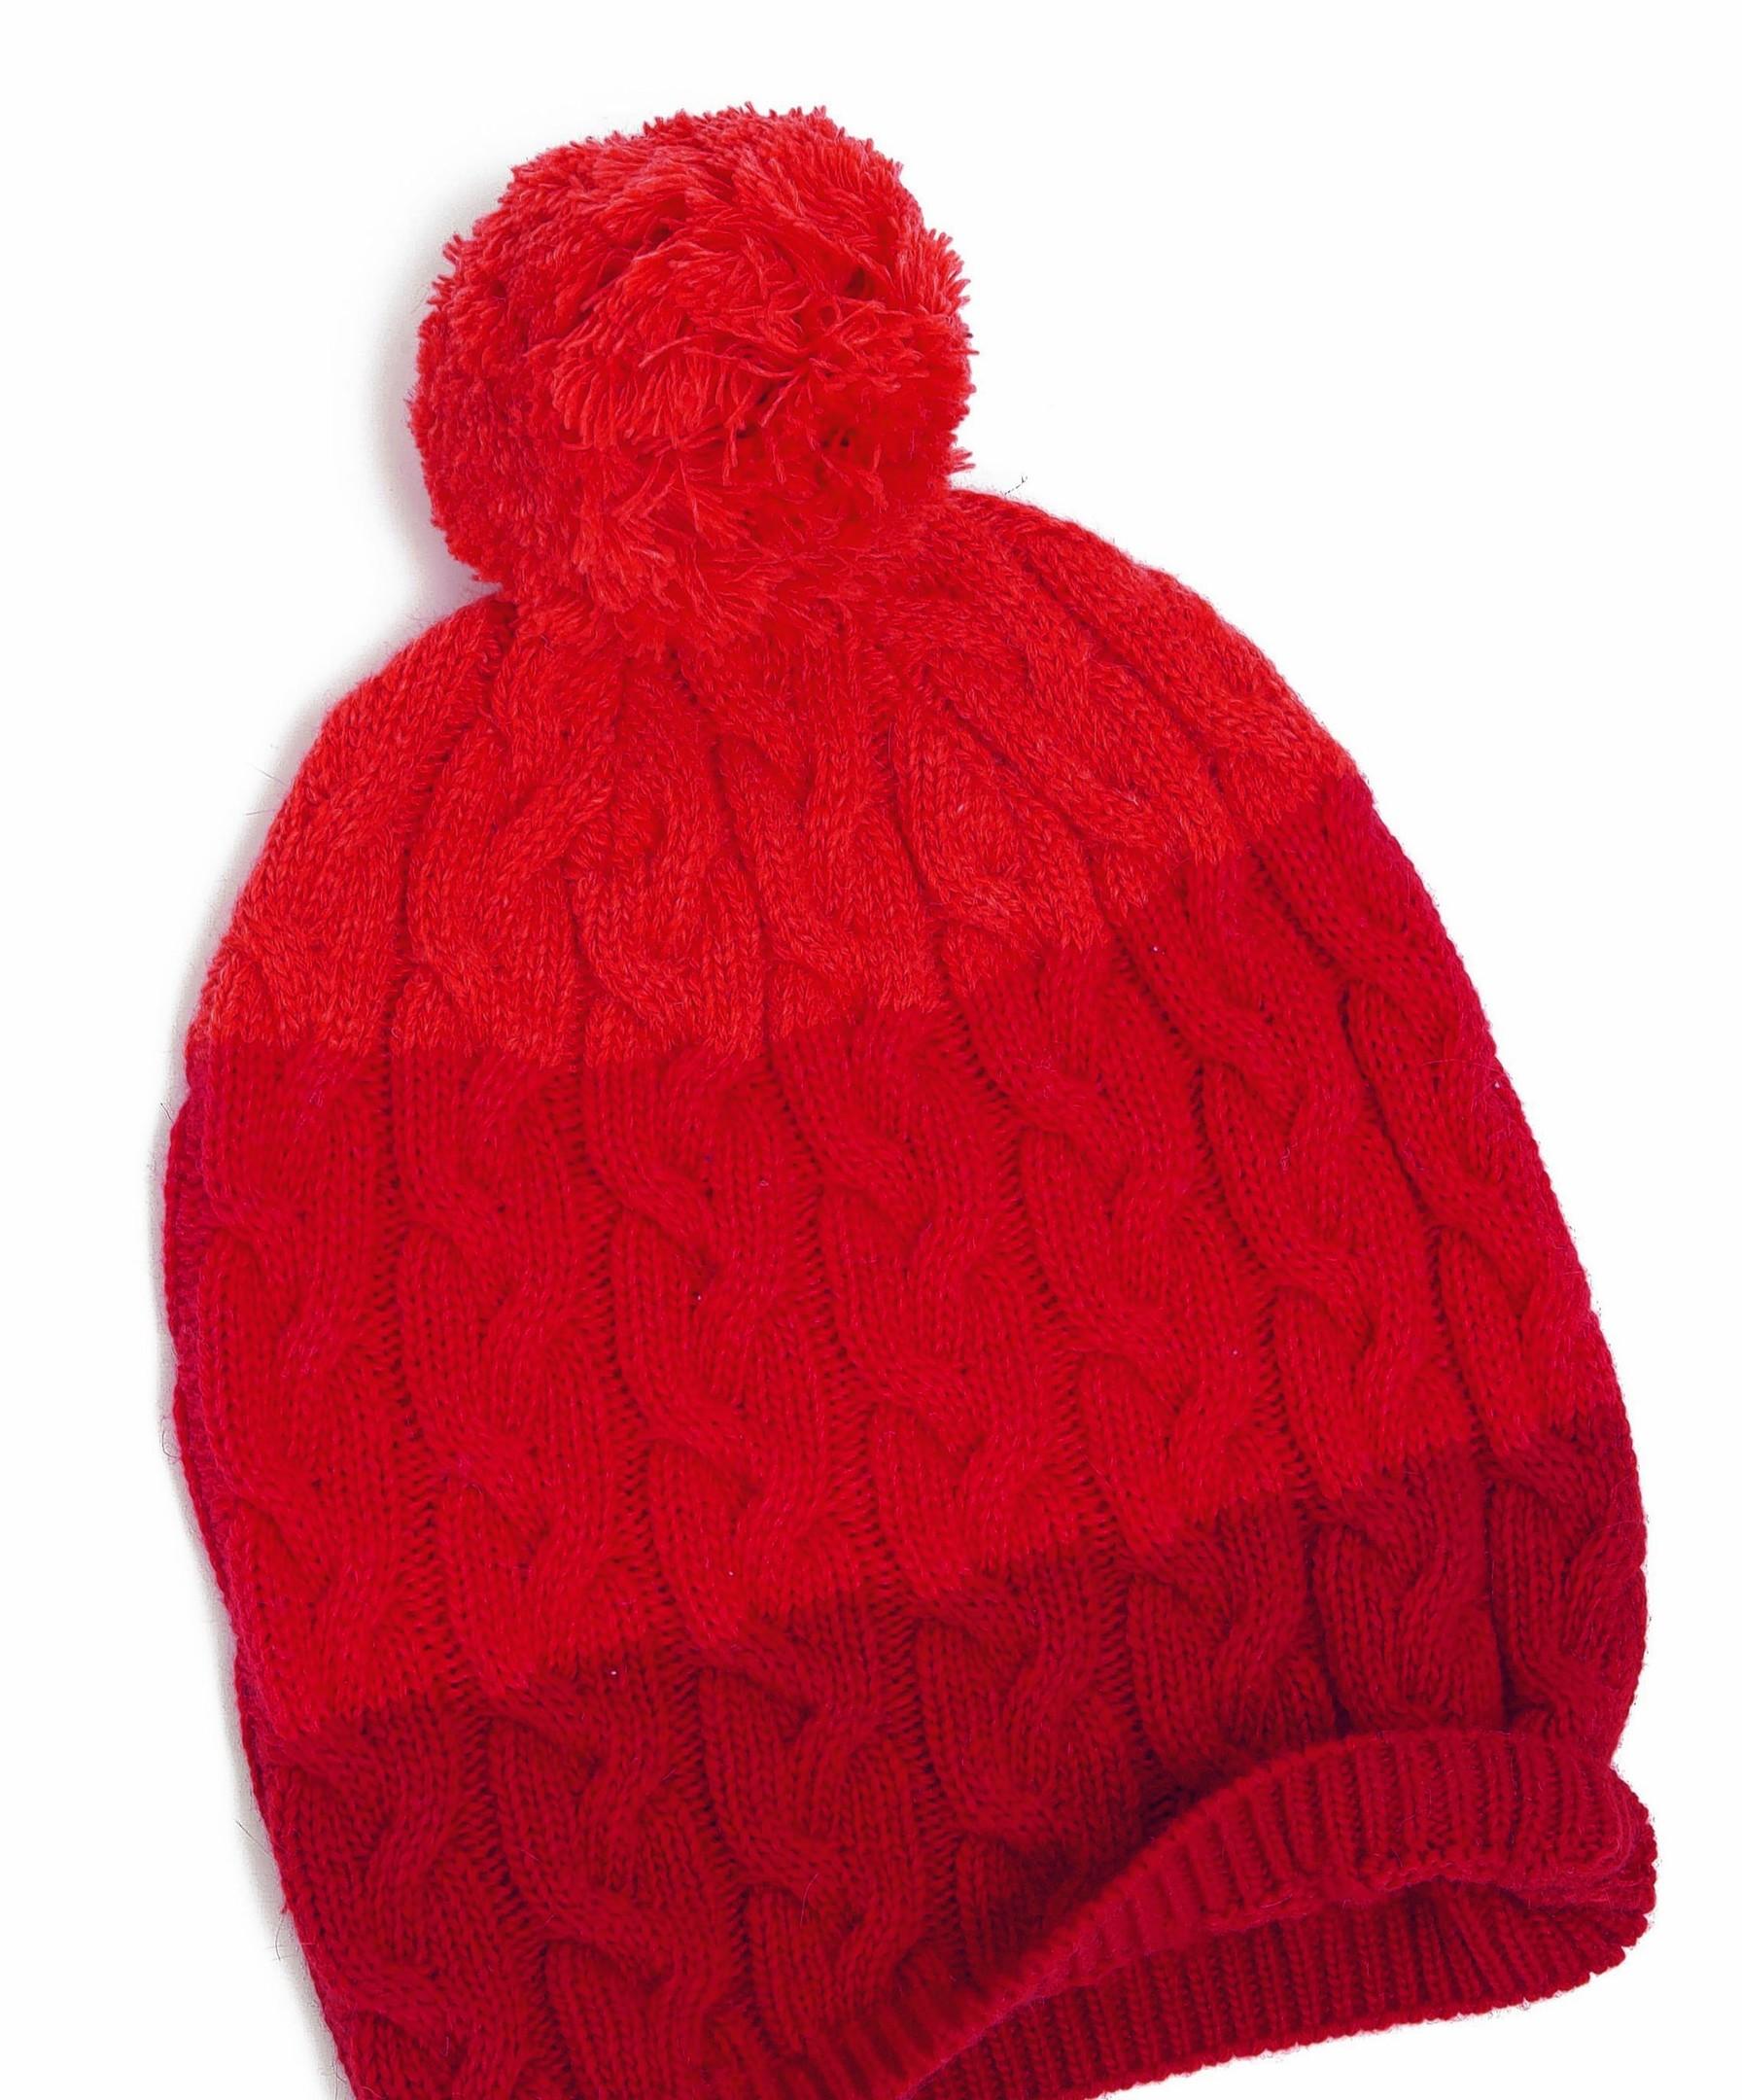 Yumi striped bobble hat, £14.99